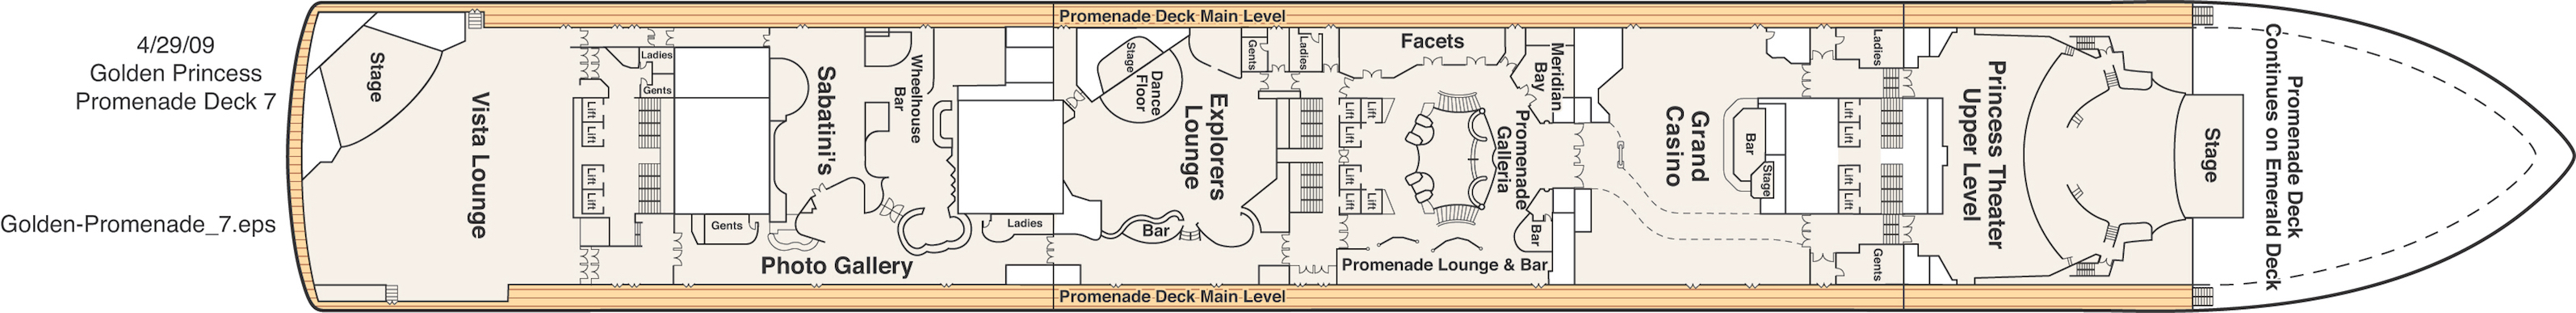 Princess Cruises Grand Class Golden Princess Deck 7.jpg